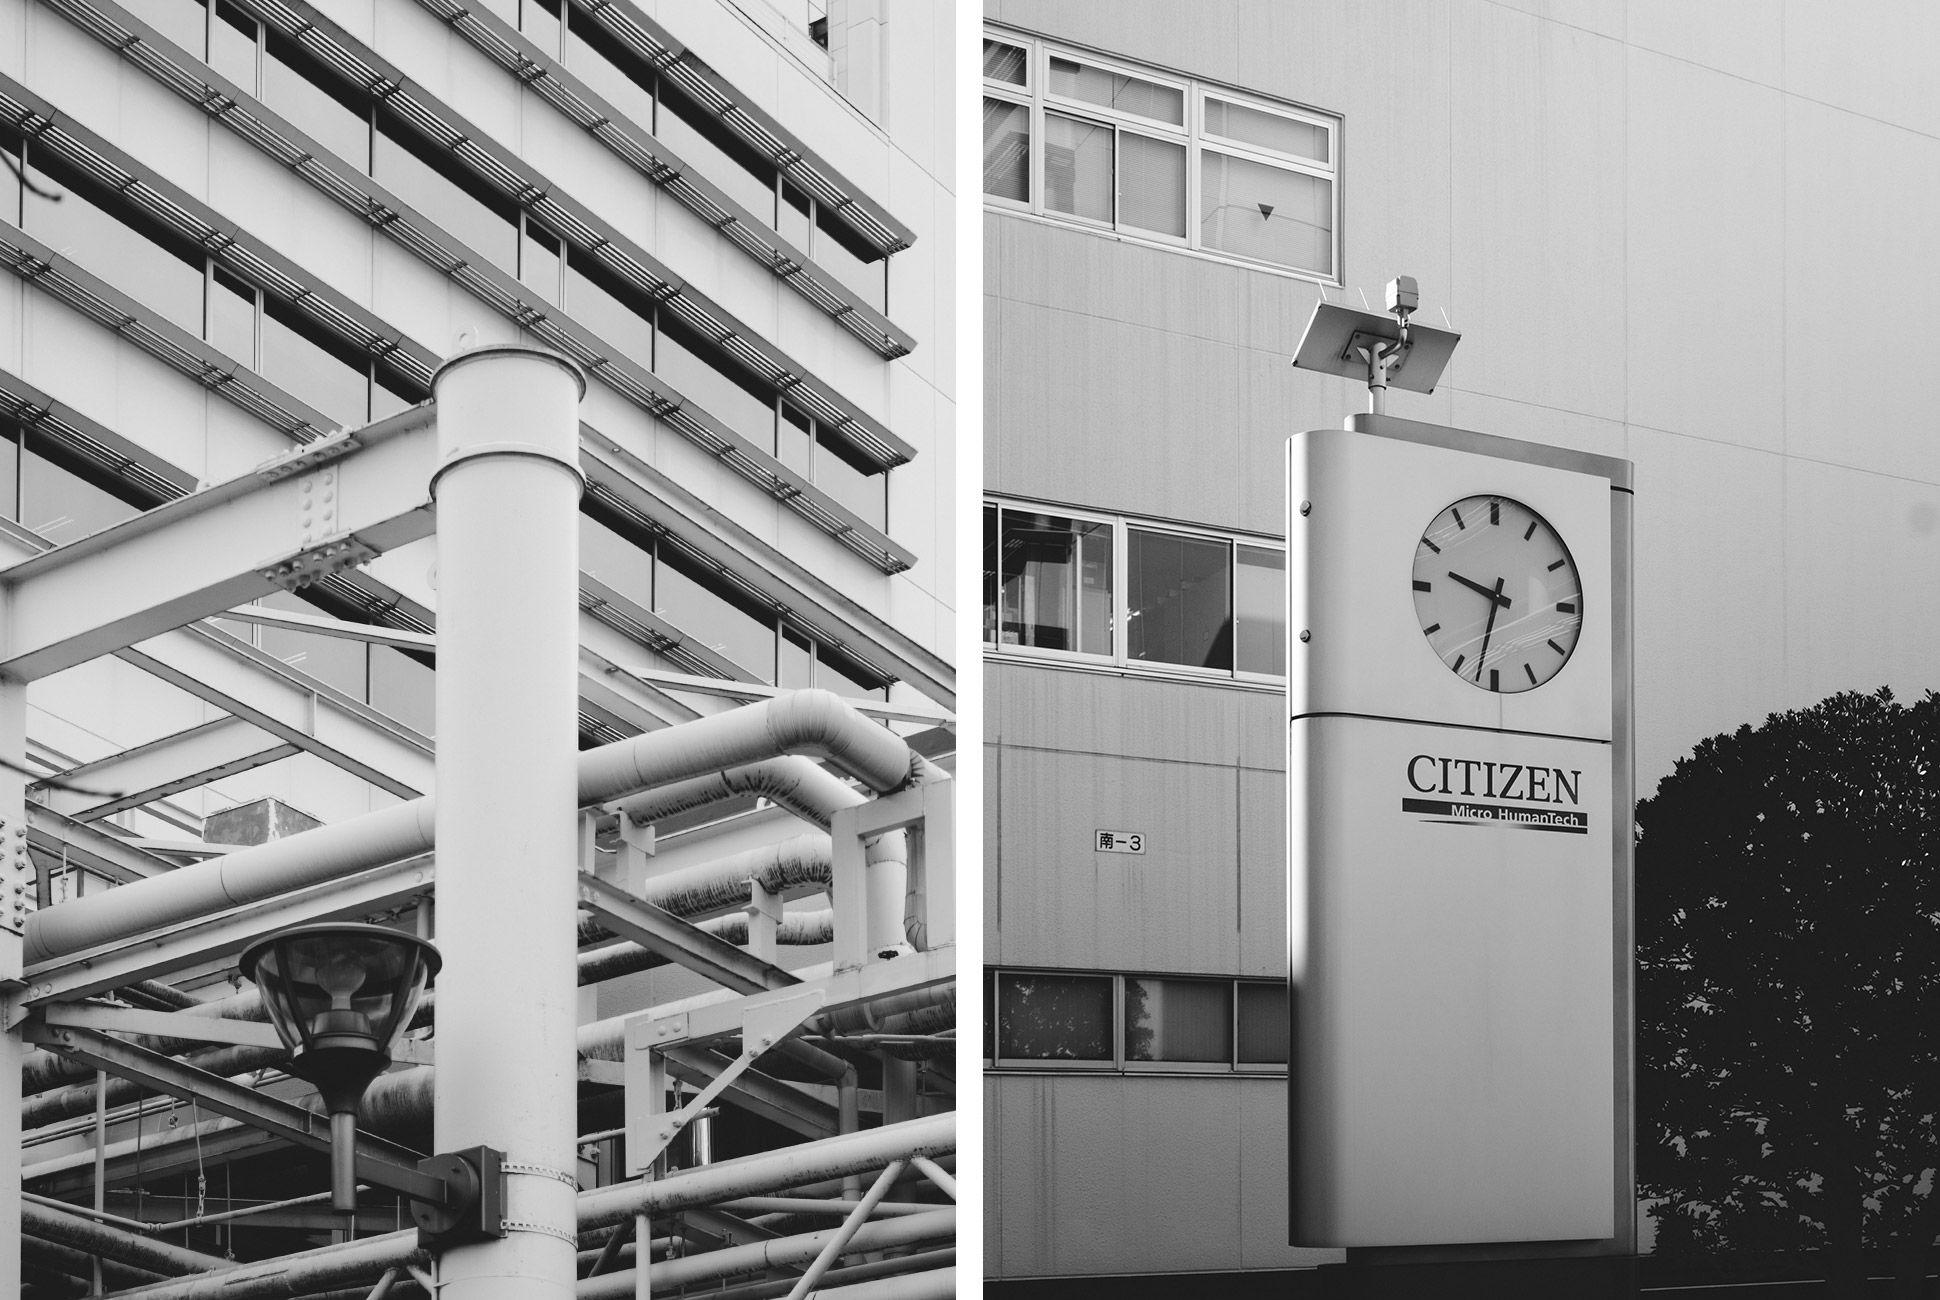 citizen-watch-factory-visit-gear-patrol-13